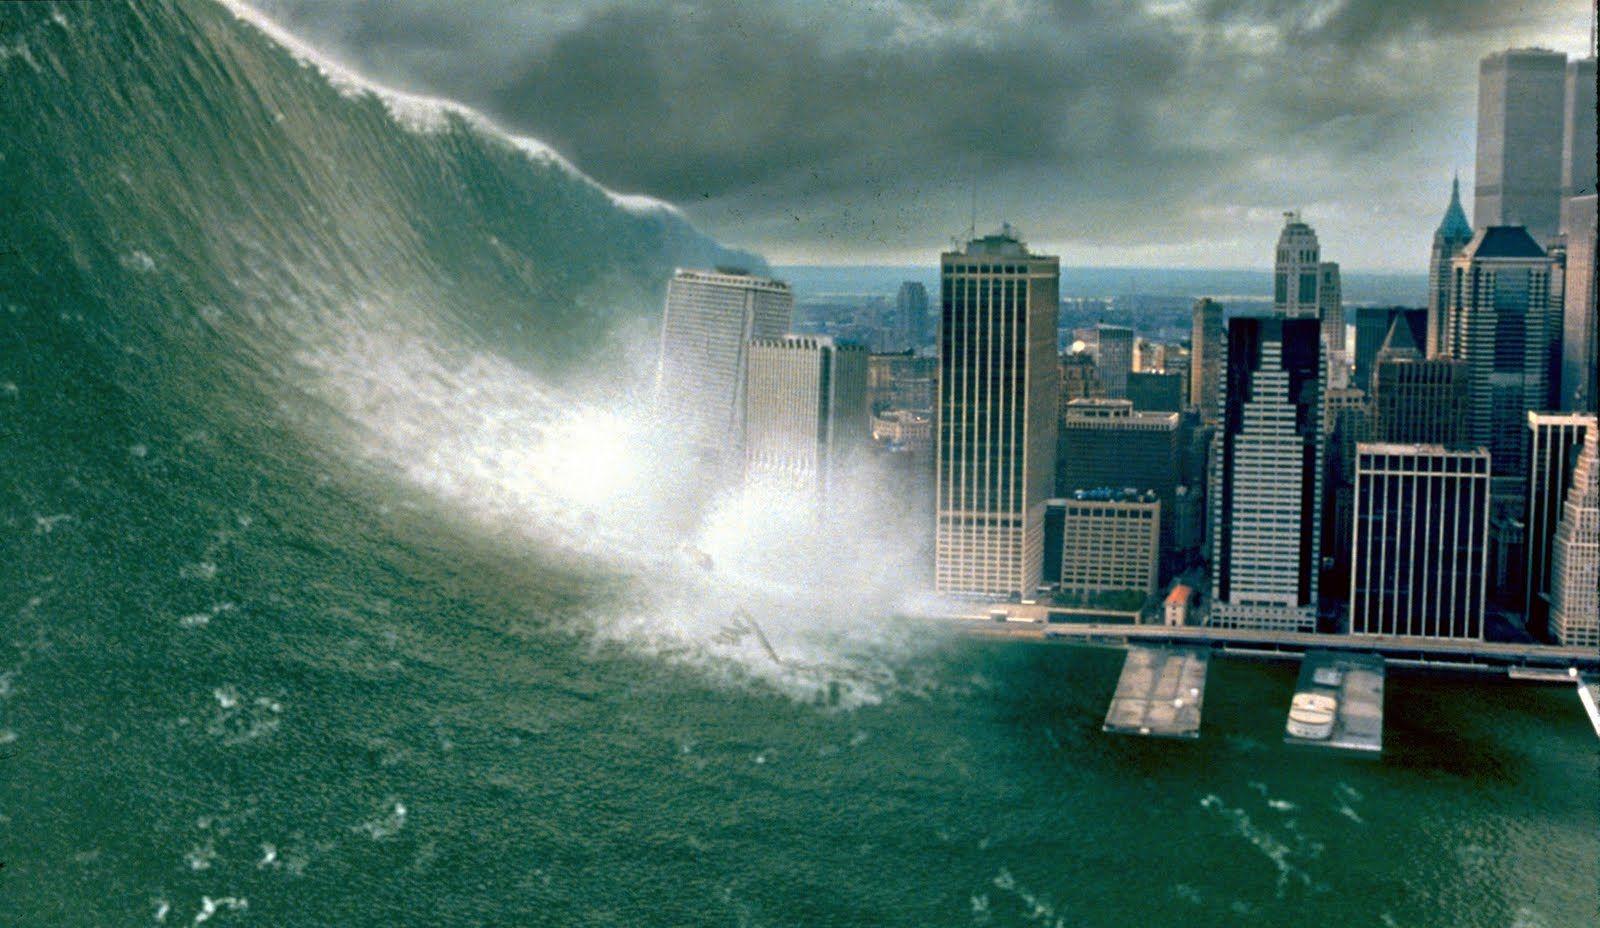 Tsunami in Deep Impact (1998)